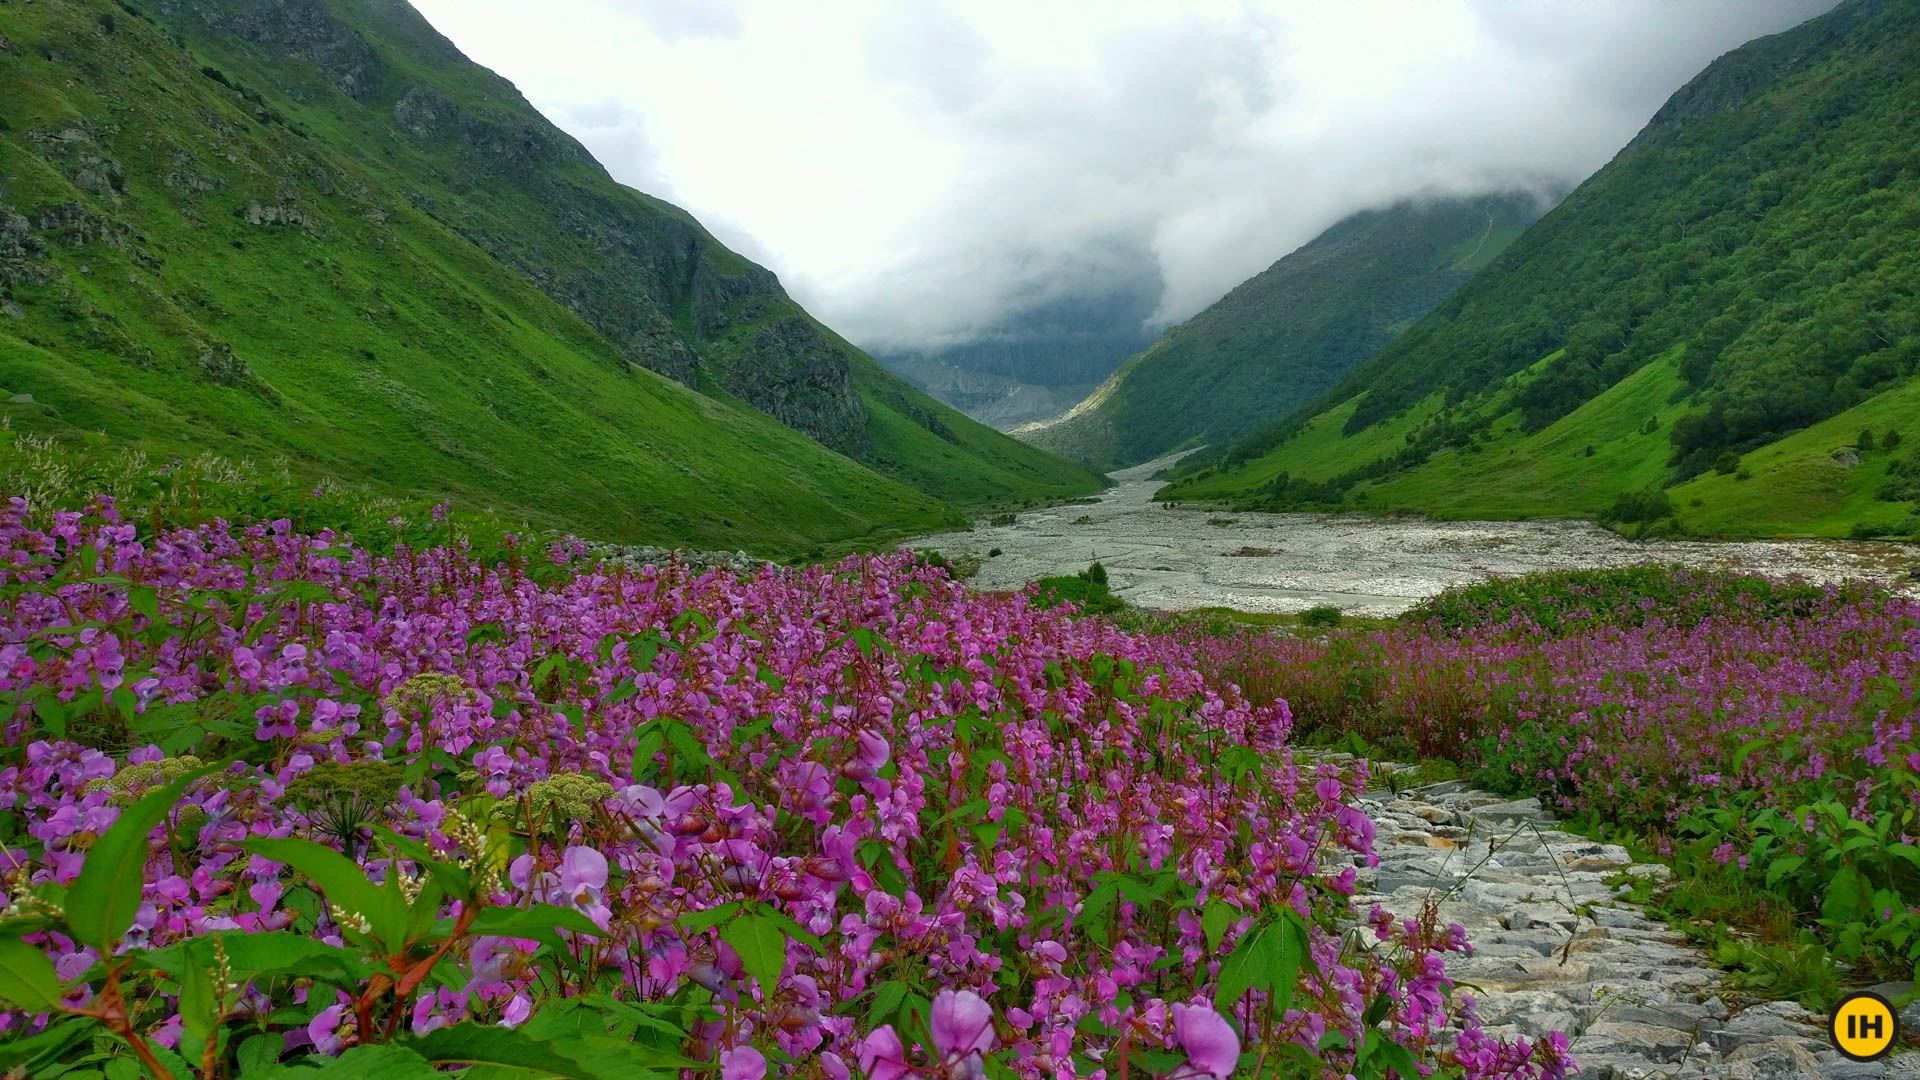 Valley of Flowers Trek - Explore the stunning valley of flowers